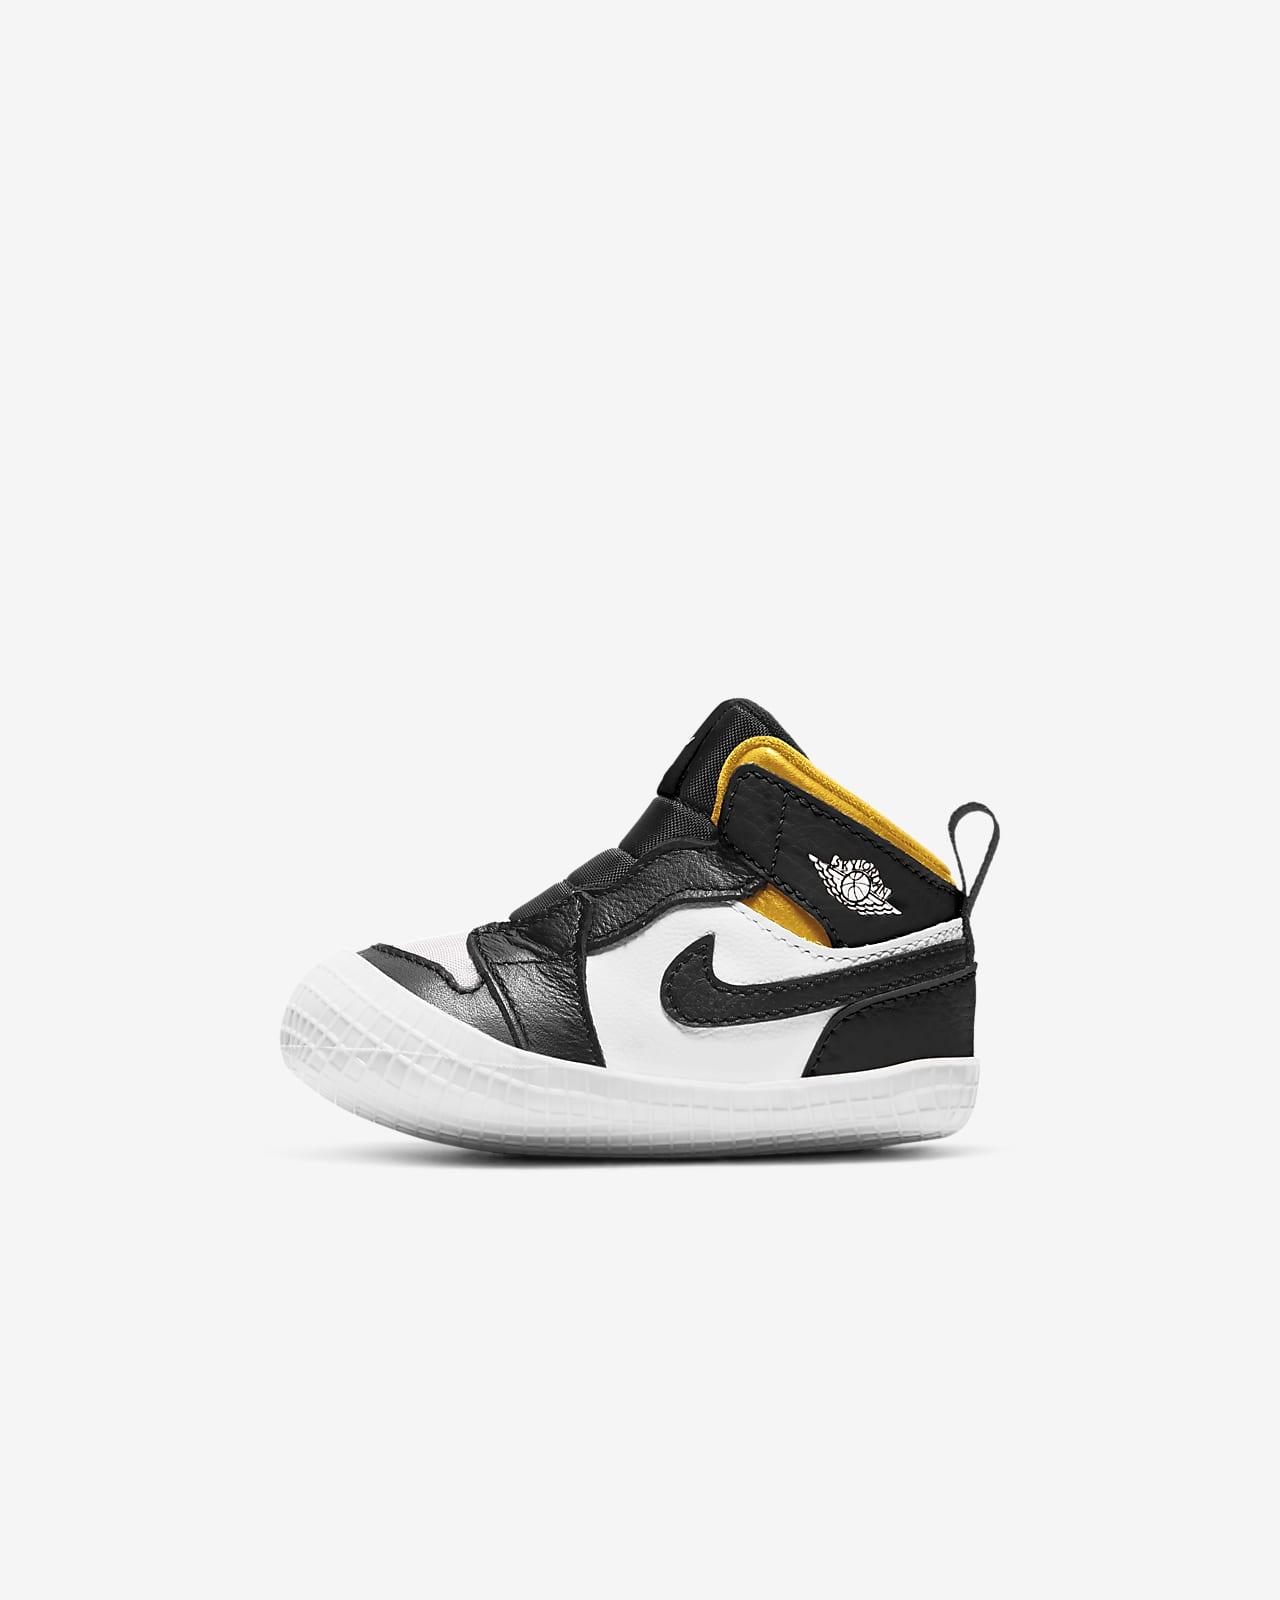 Jordan 1 嬰兒靴款